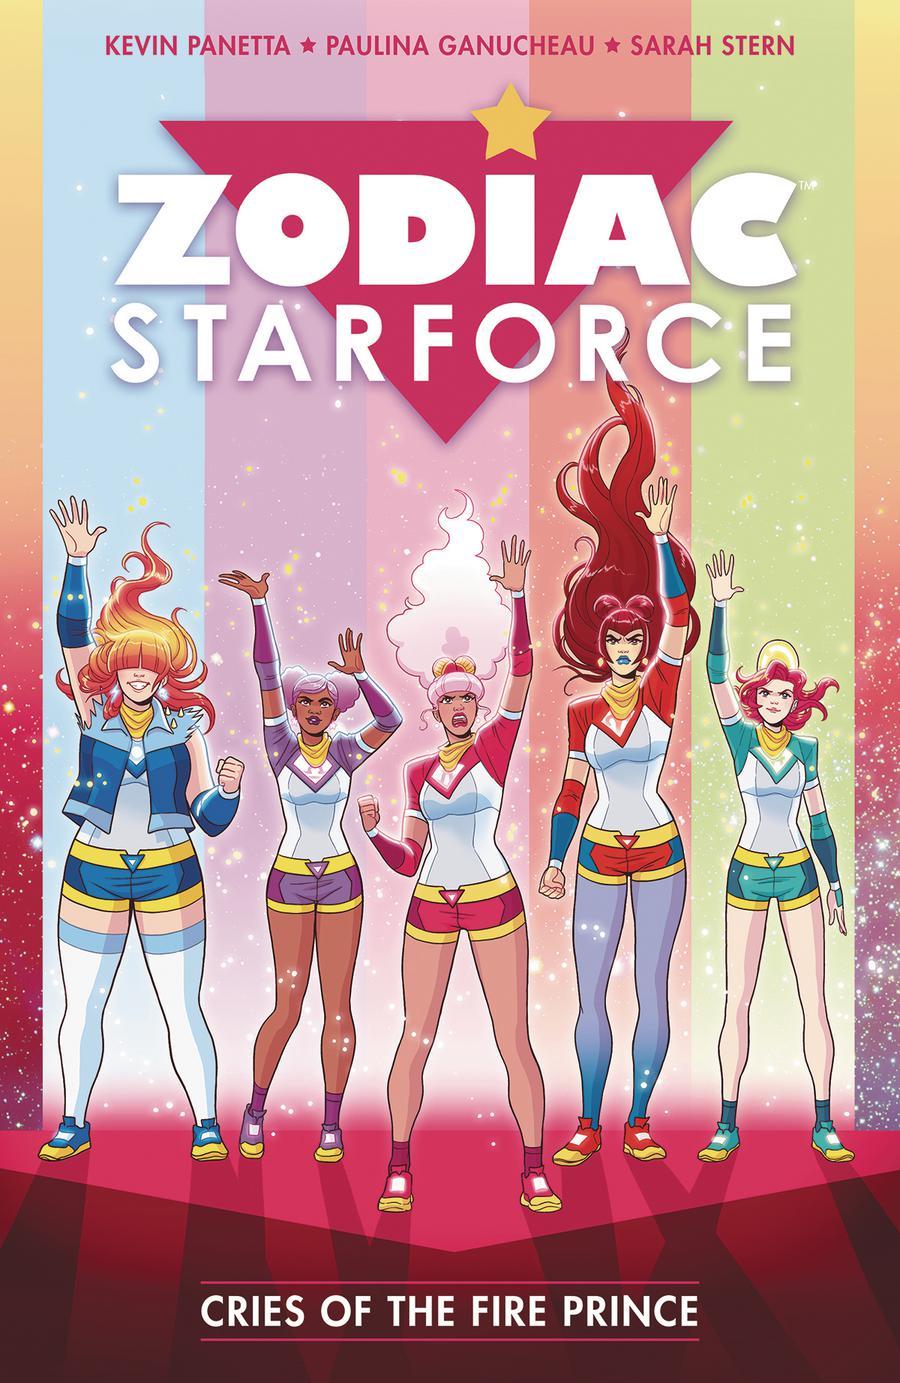 Zodiac Starforce Vol 2 Cries Of The Fire Prince TP